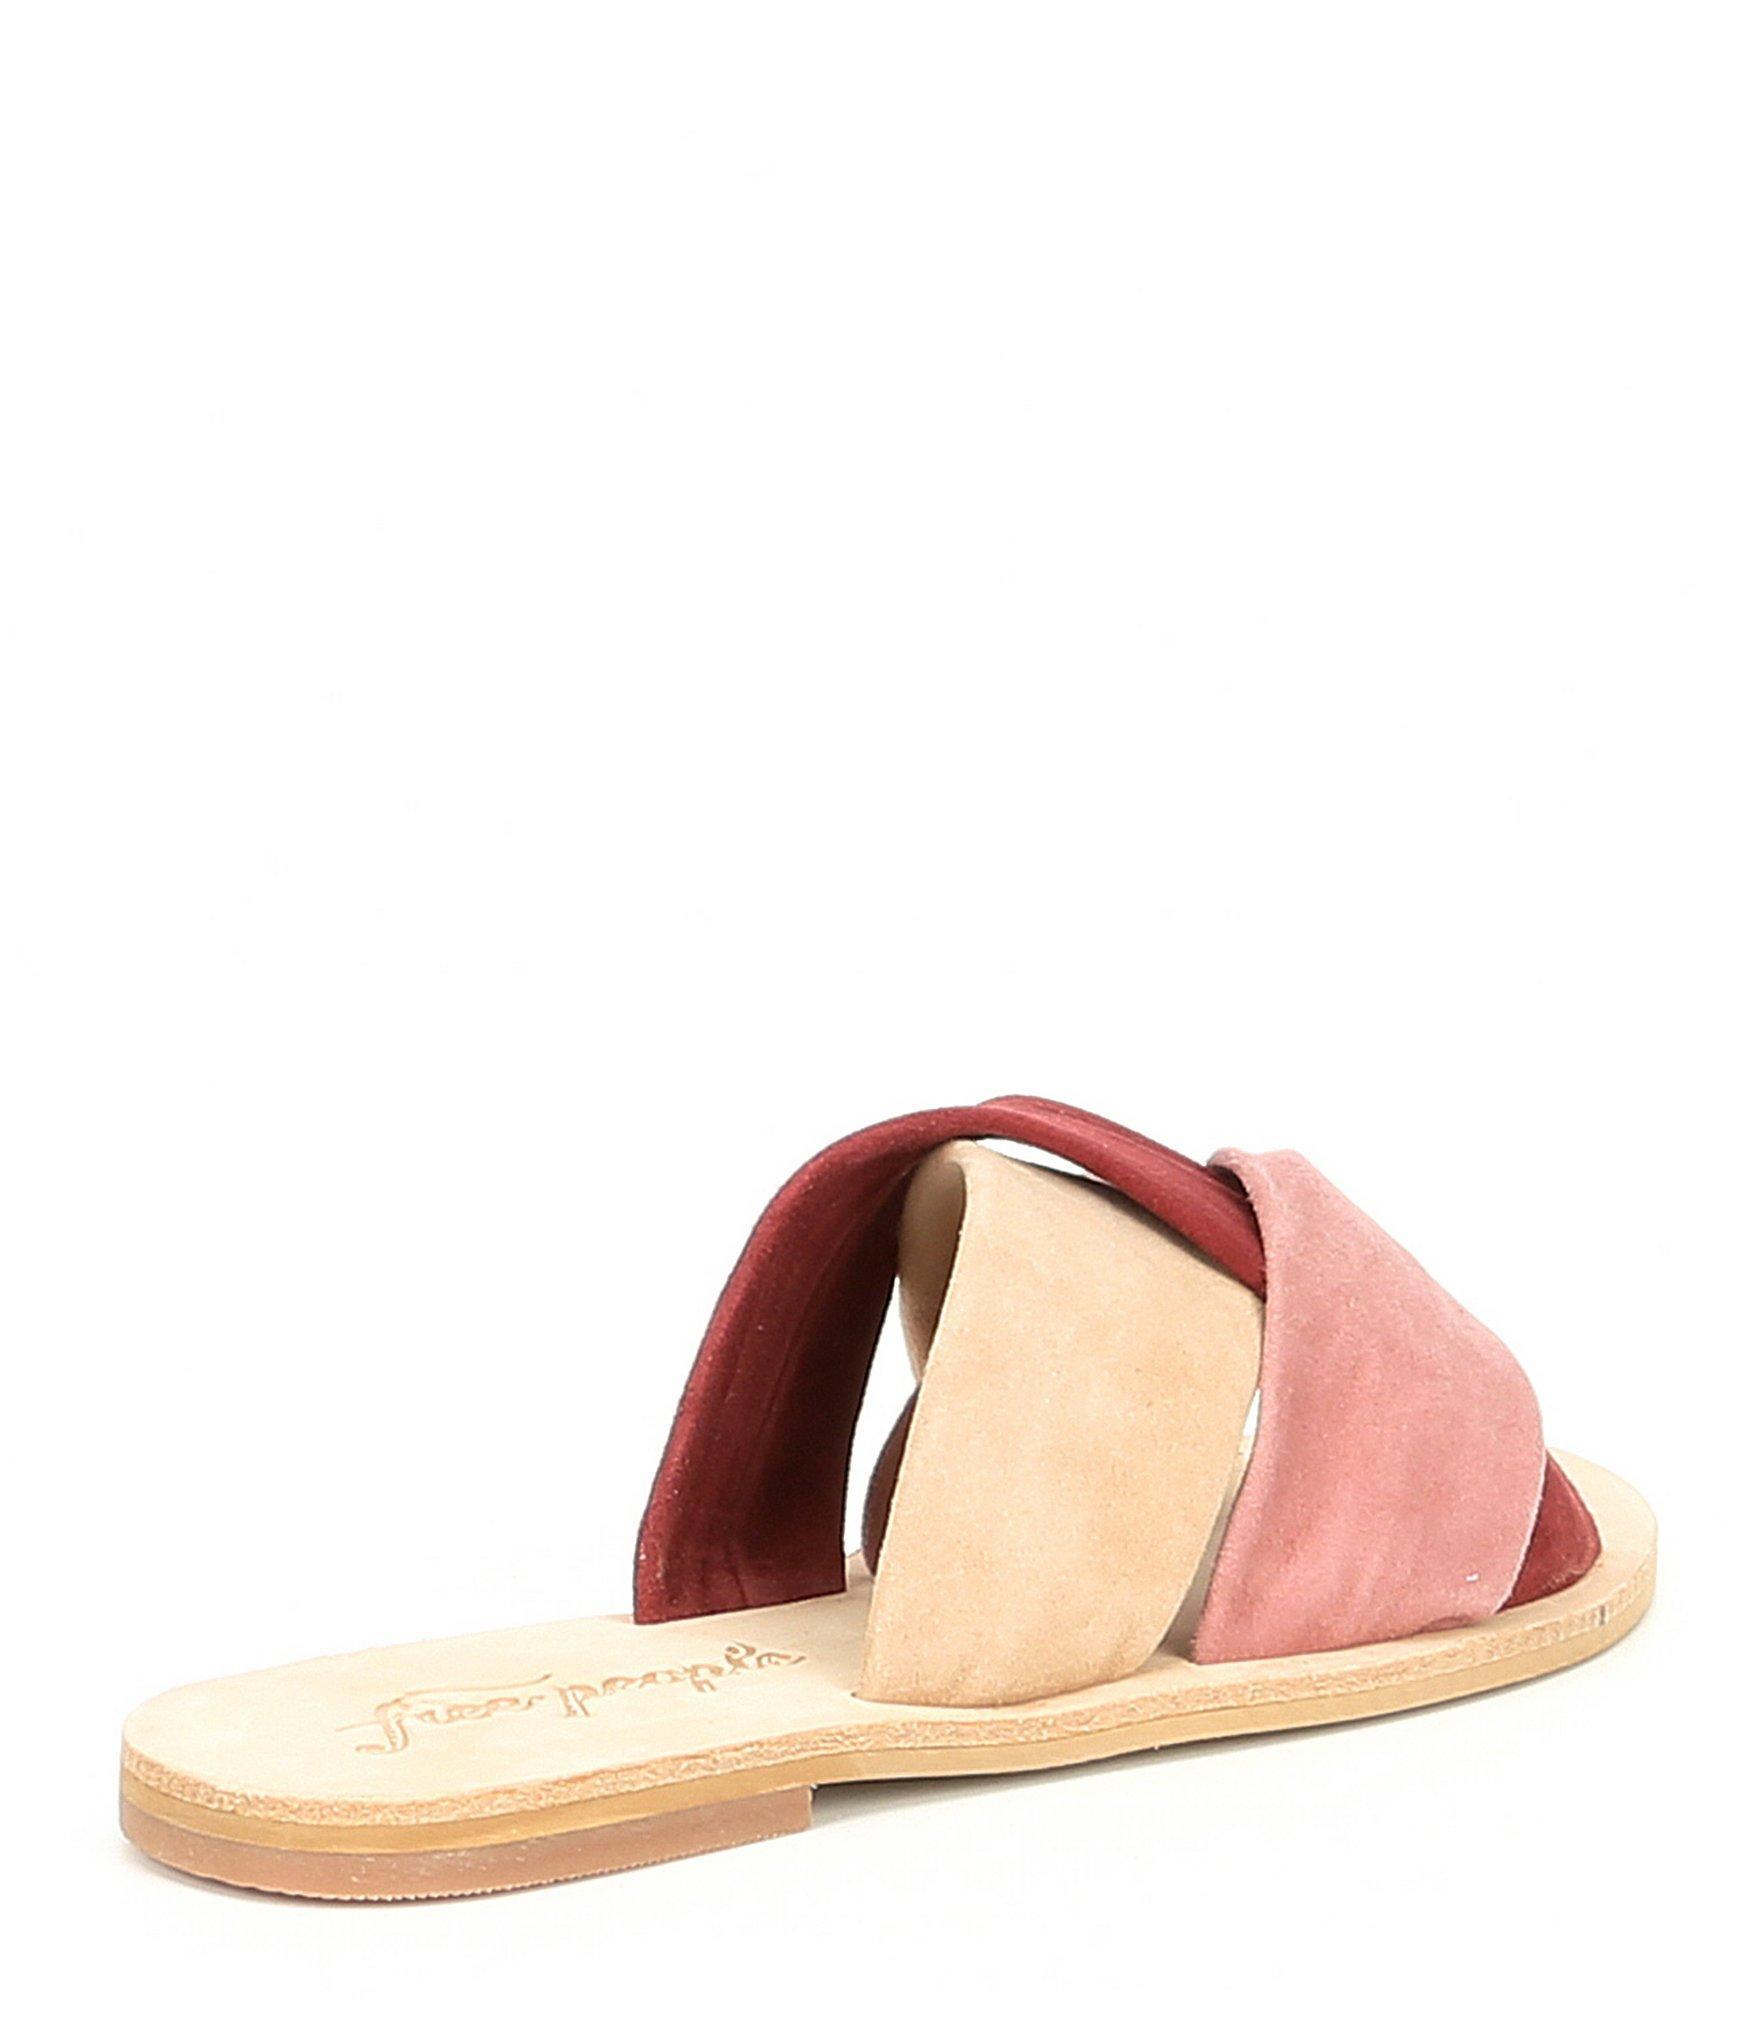 316c7656a4e2 Free People - Pink Rio Vista Suede Slide Sandals - Lyst. View fullscreen